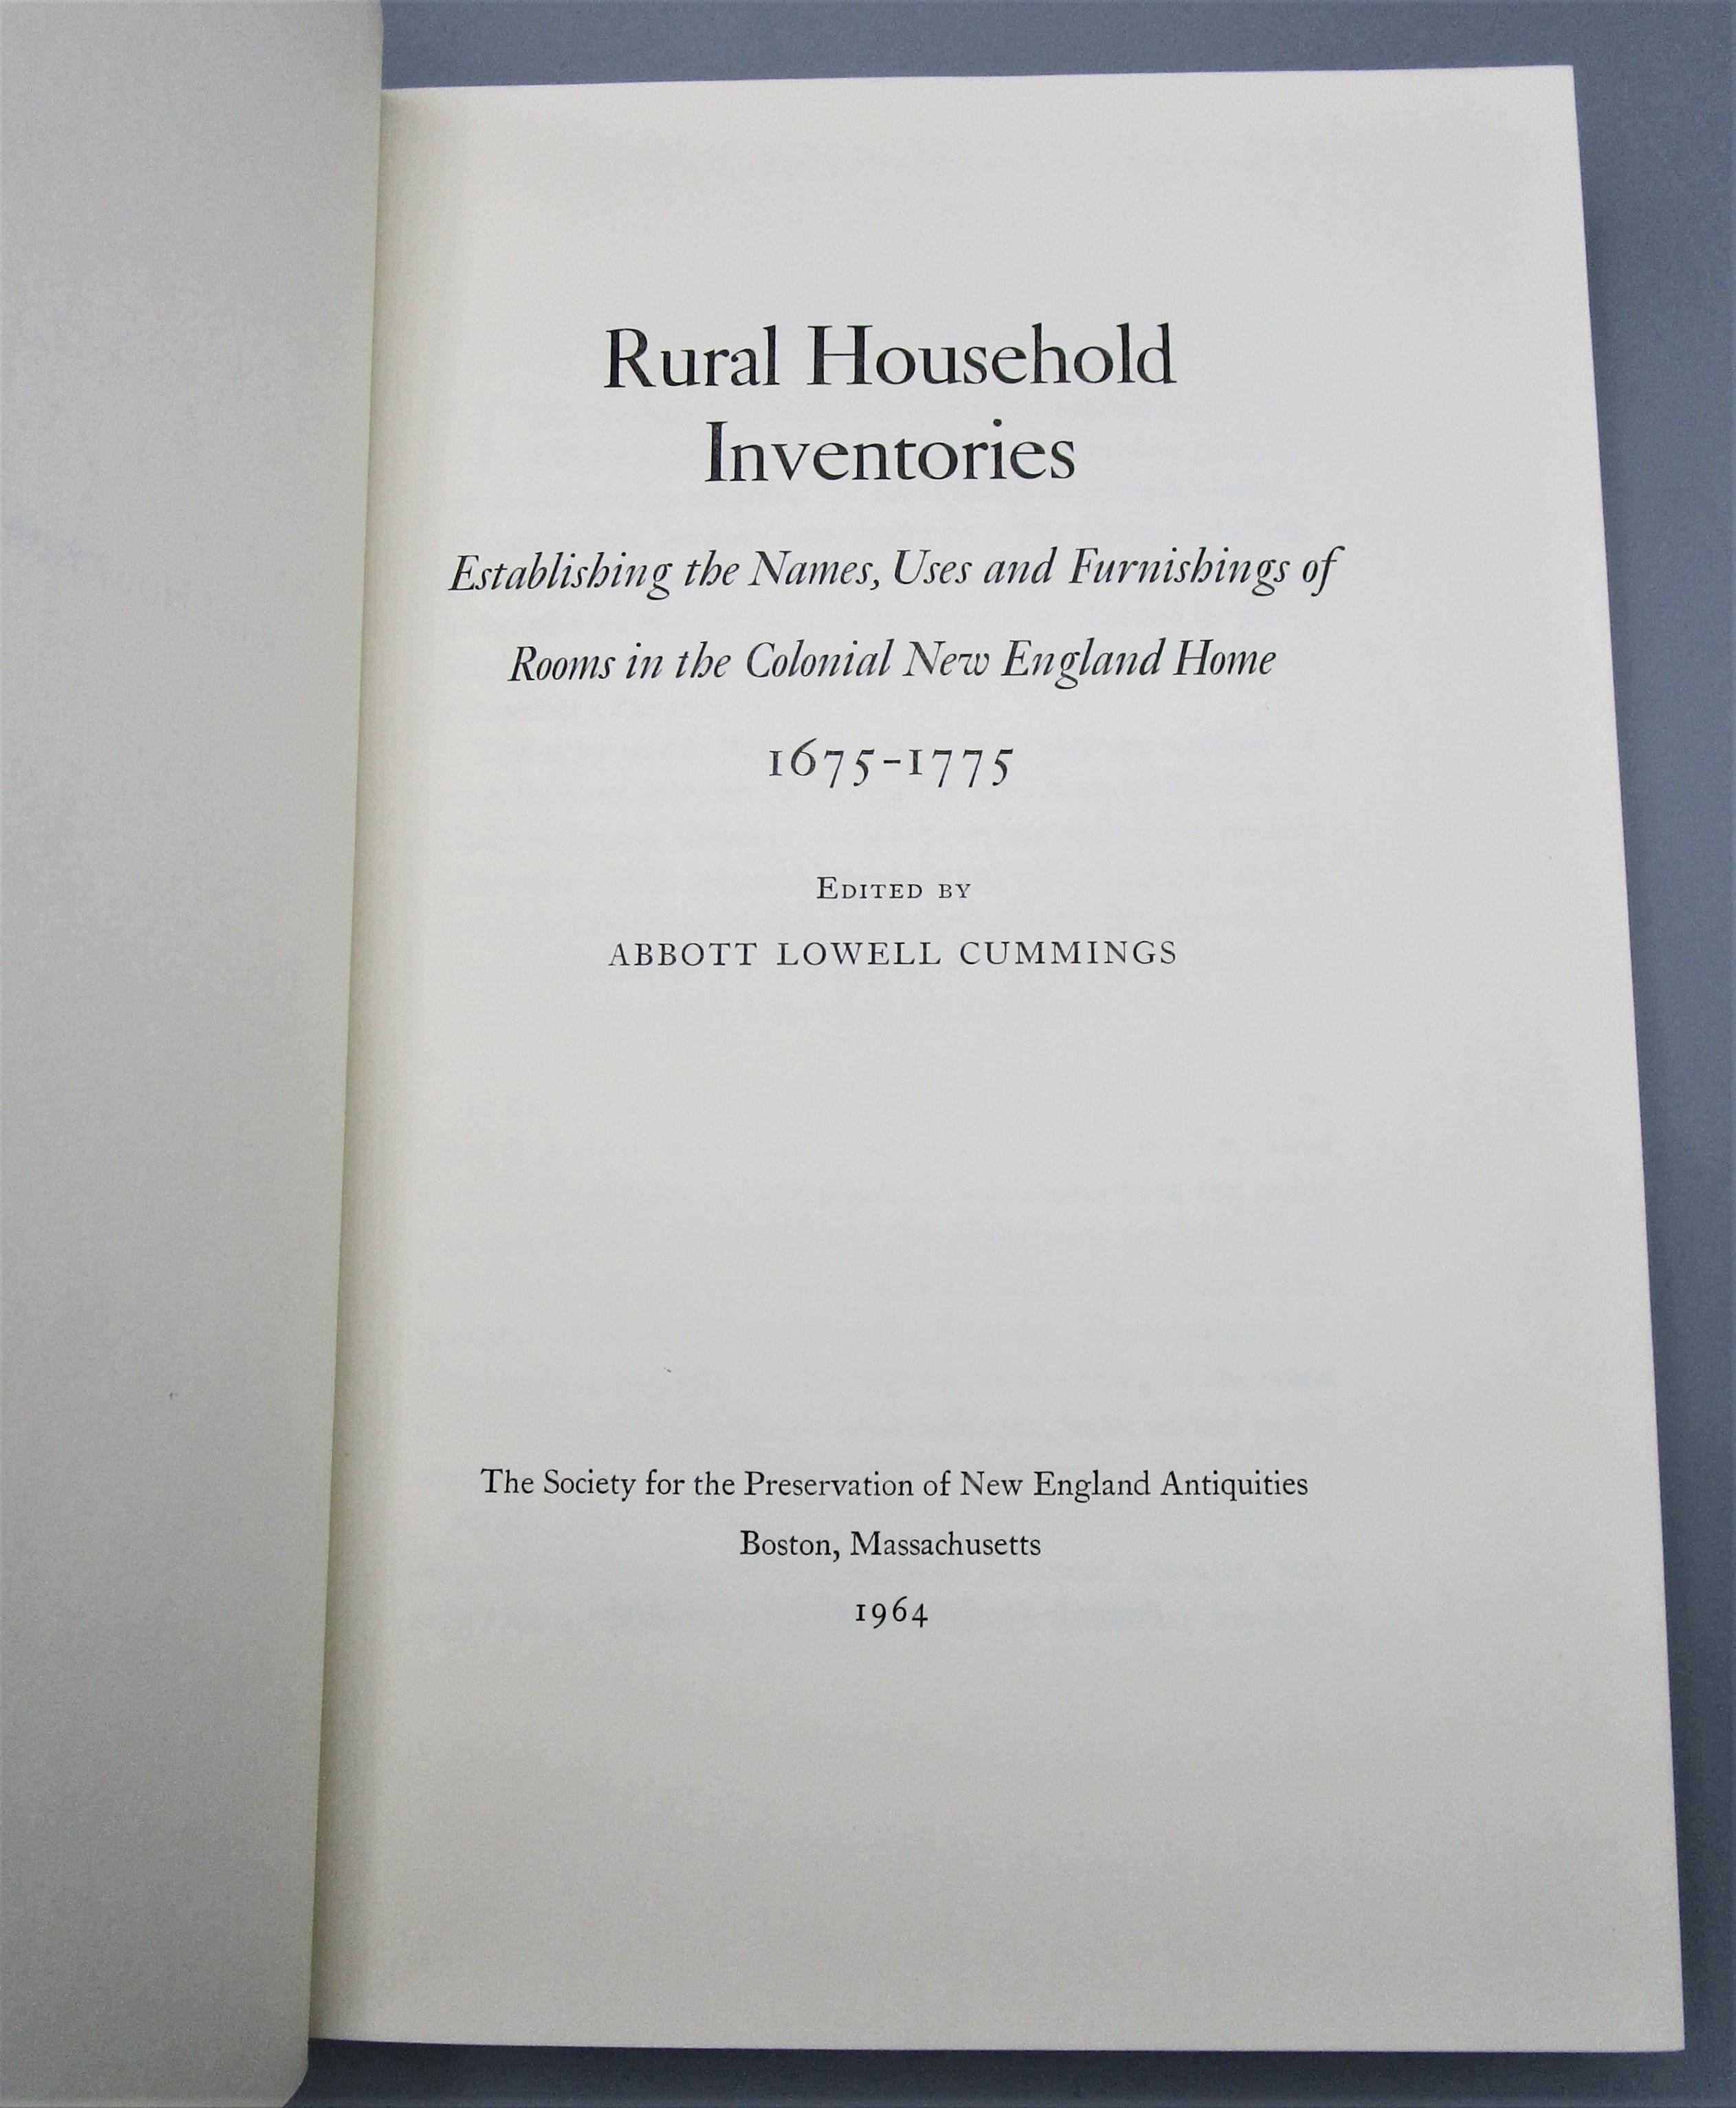 RURAL HOUSEHOLD INVENTORIES 1675-1775, by Abbott Lowell Cummings - 1964